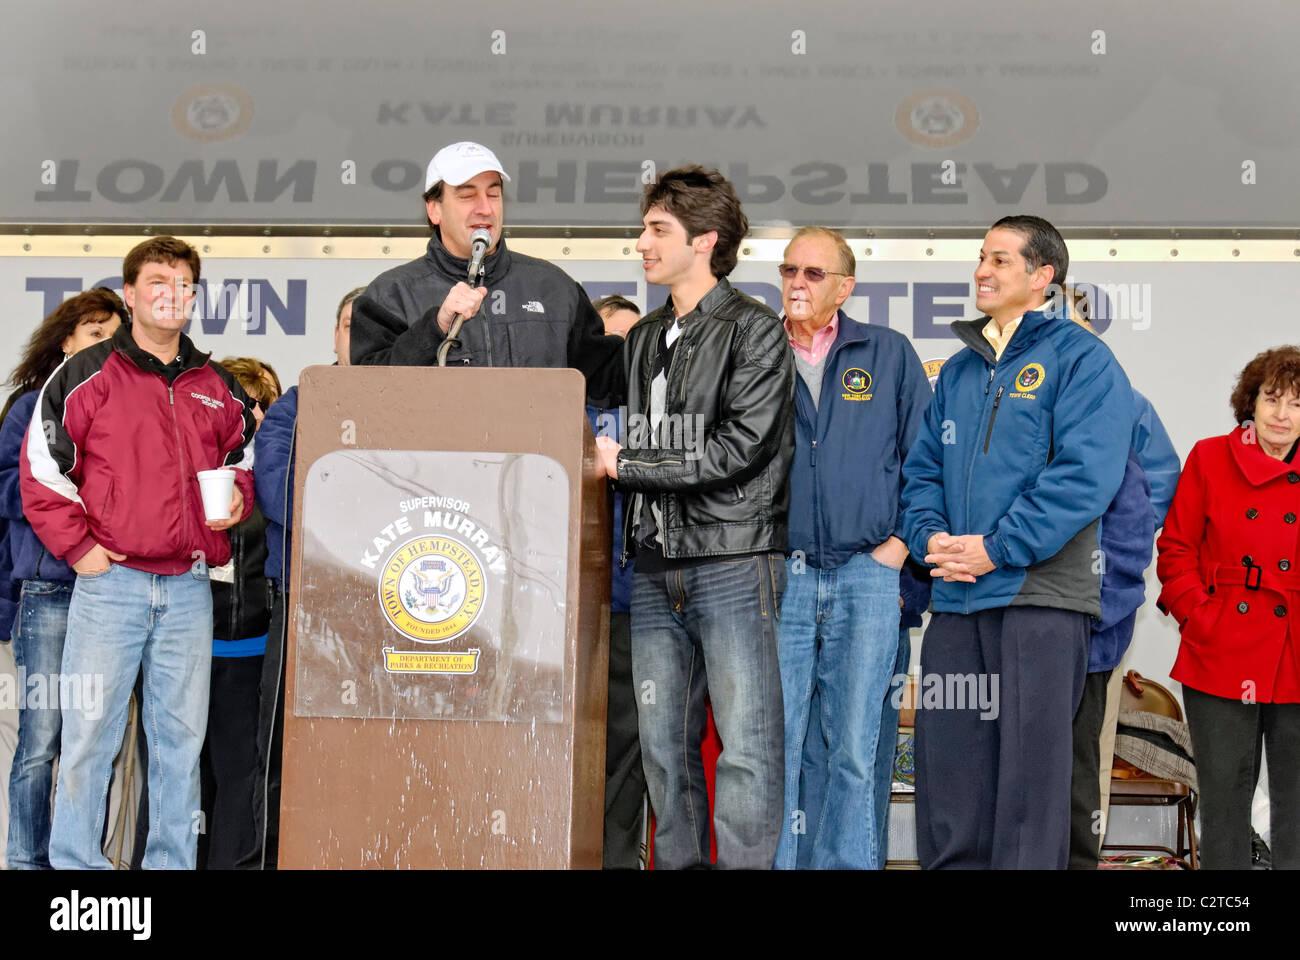 APRIL 16, 2011 - MERRICK, NY: Robbie Rosen, American Idol contestant, honored by Nassau County Executive Ed Mangano - Stock Image